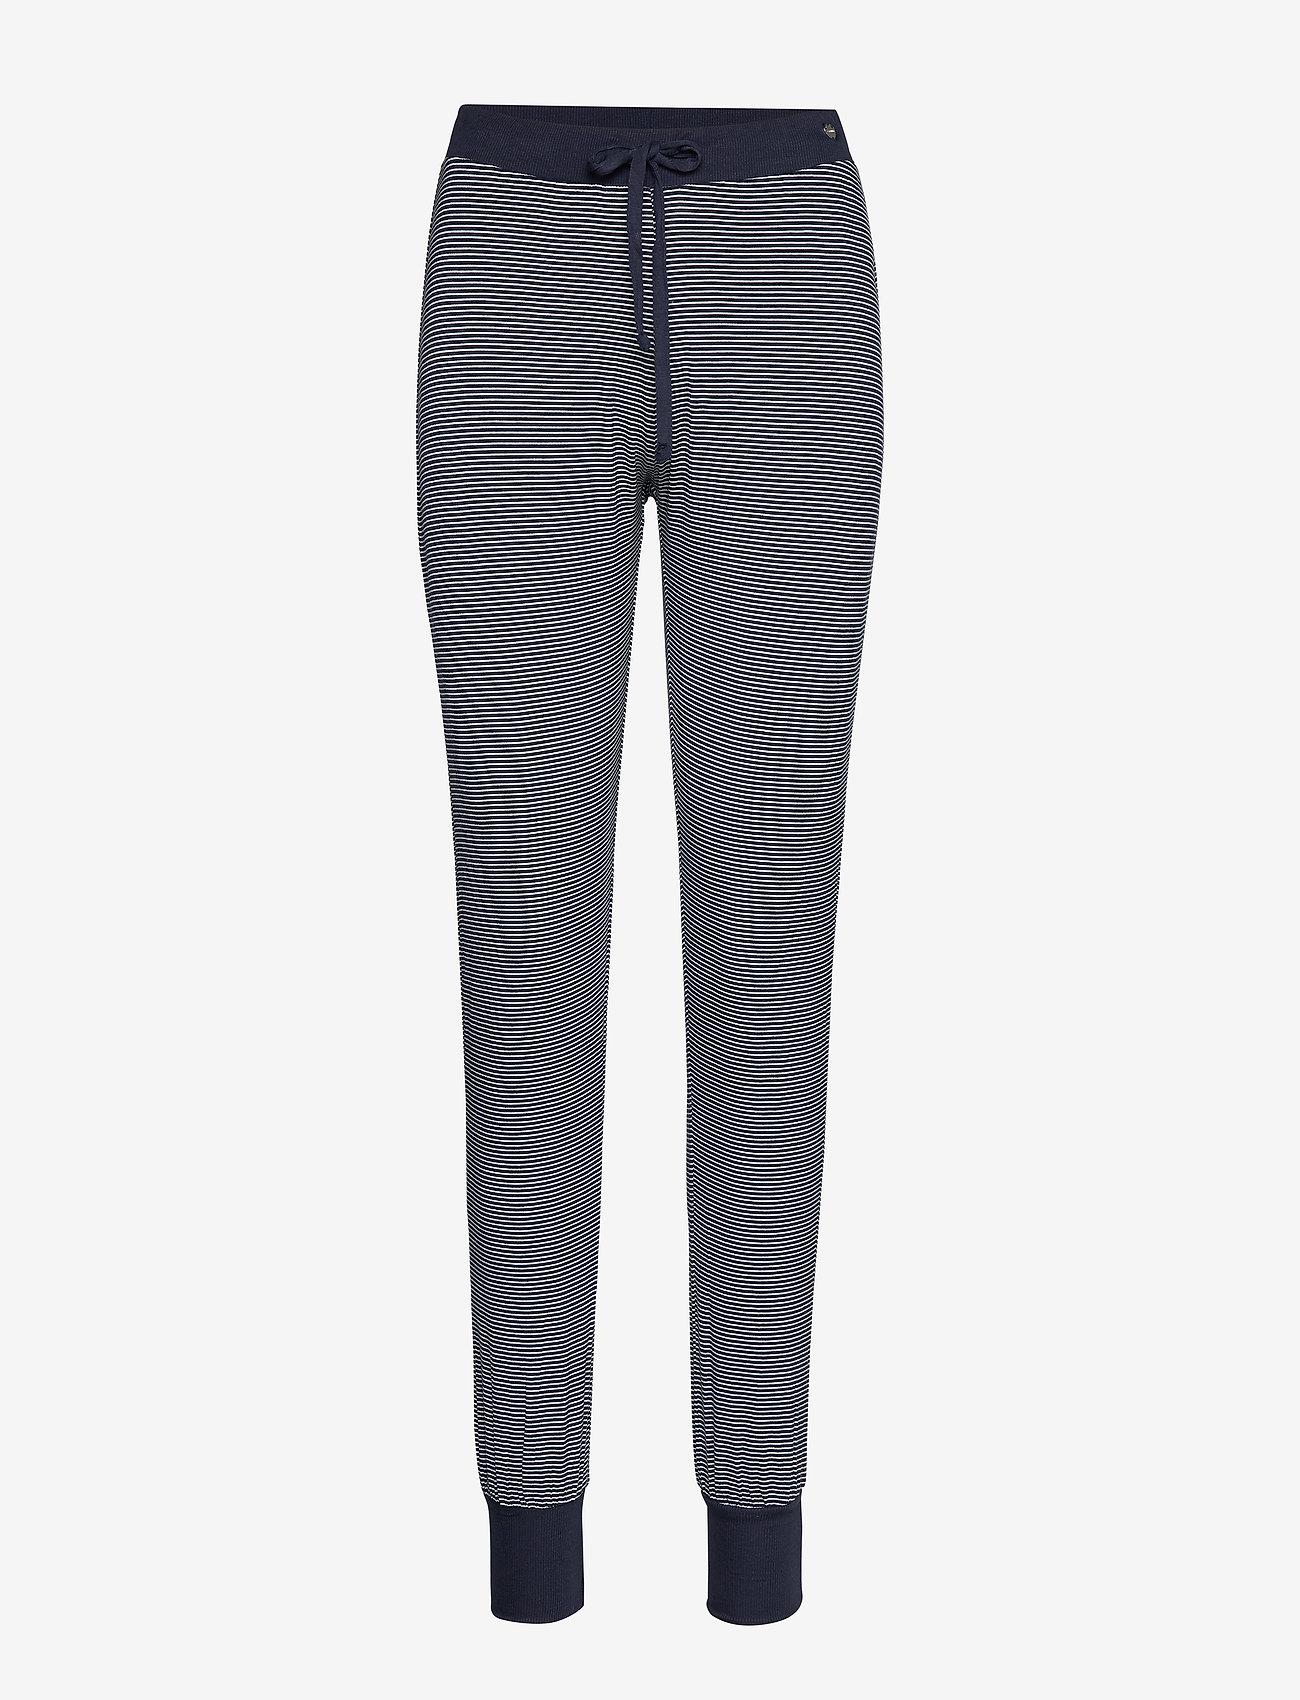 Esprit Bodywear Women - Nightpants - bottoms - navy - 0